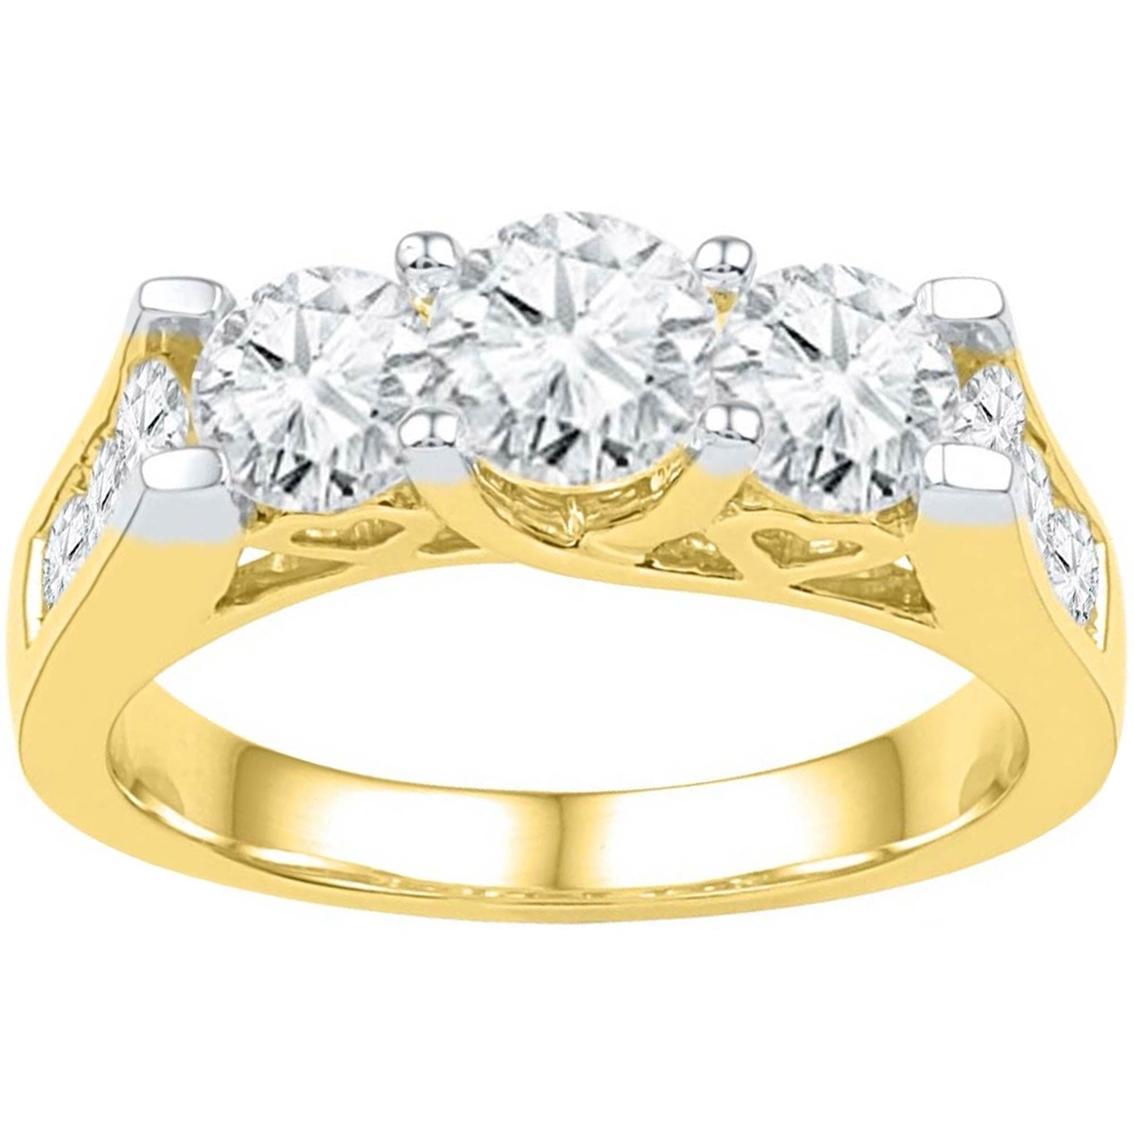 14k 2 Ctw 3 Stone Round Diamond Engagement Ring, Yellow Gold